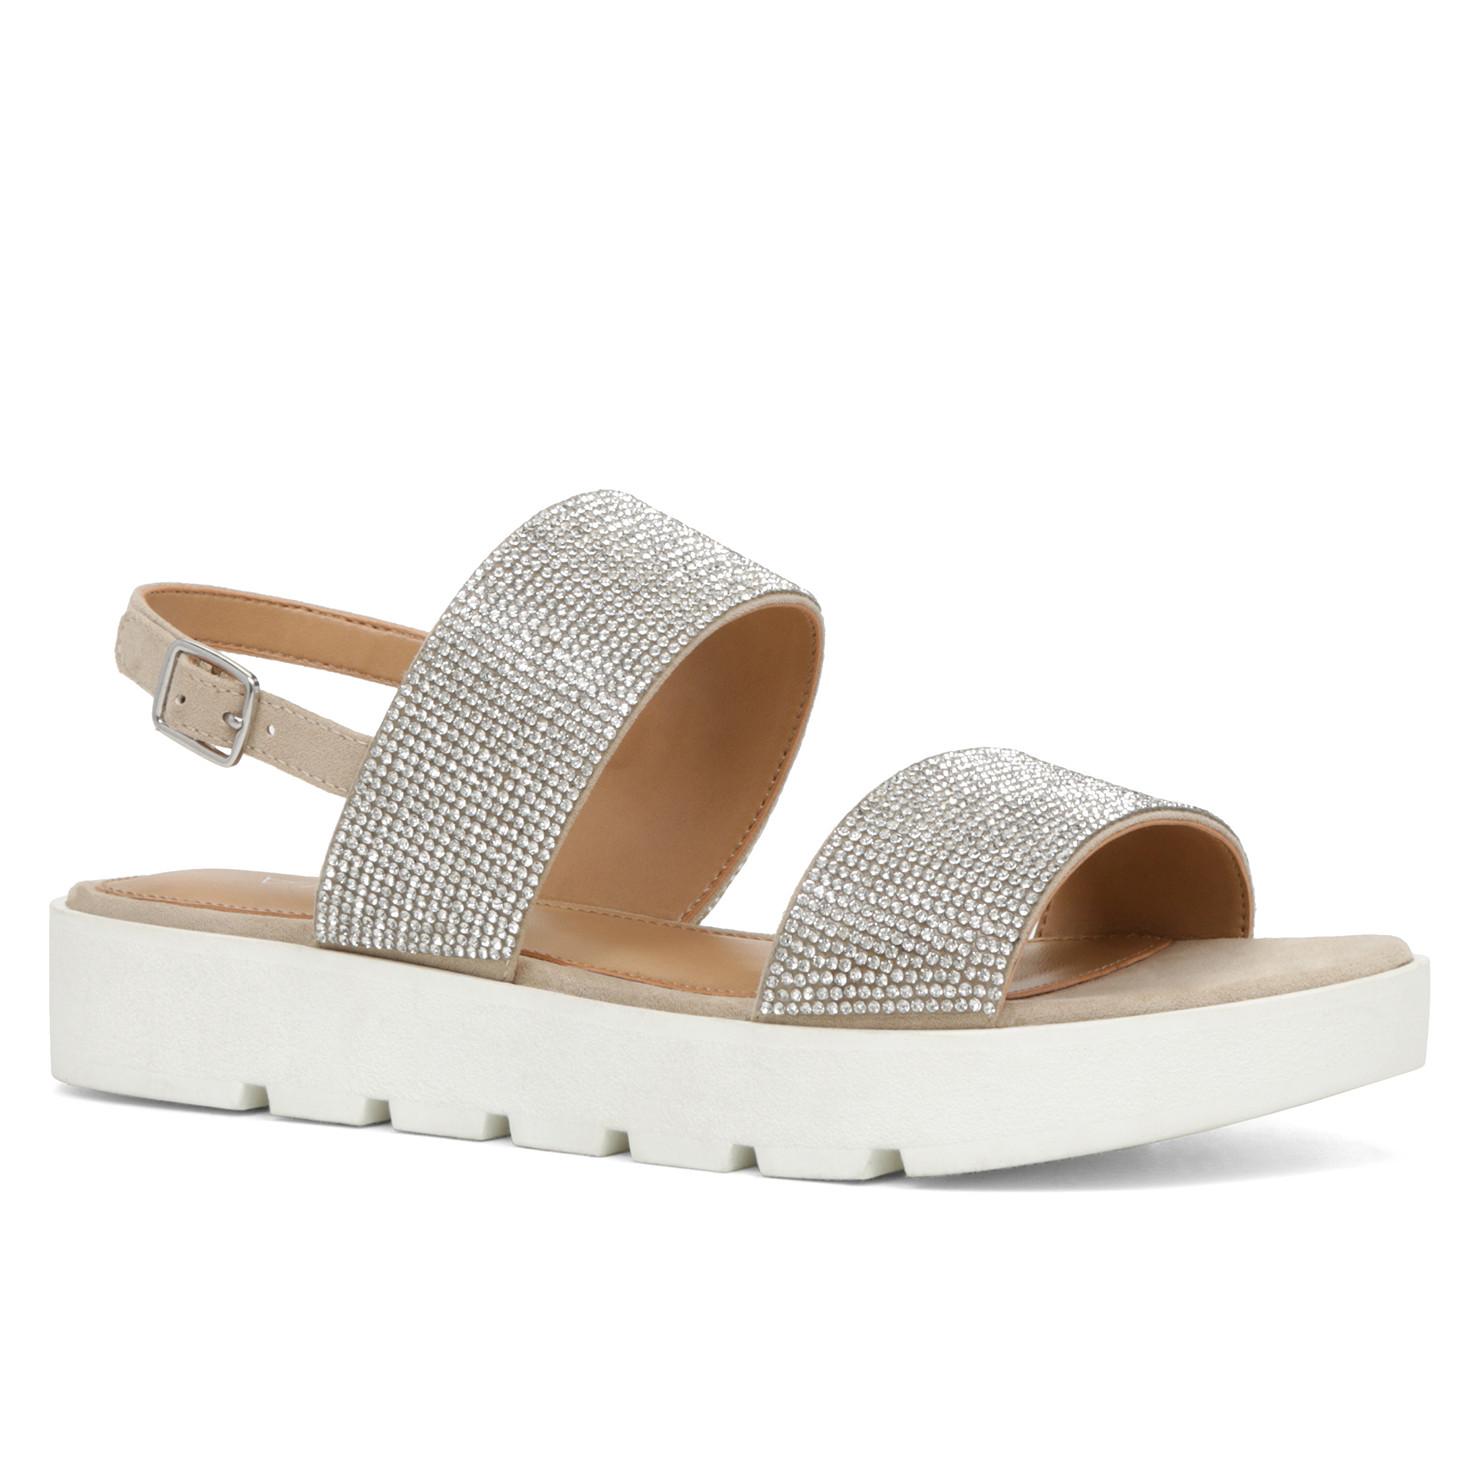 aldo white flat sandals.JPG